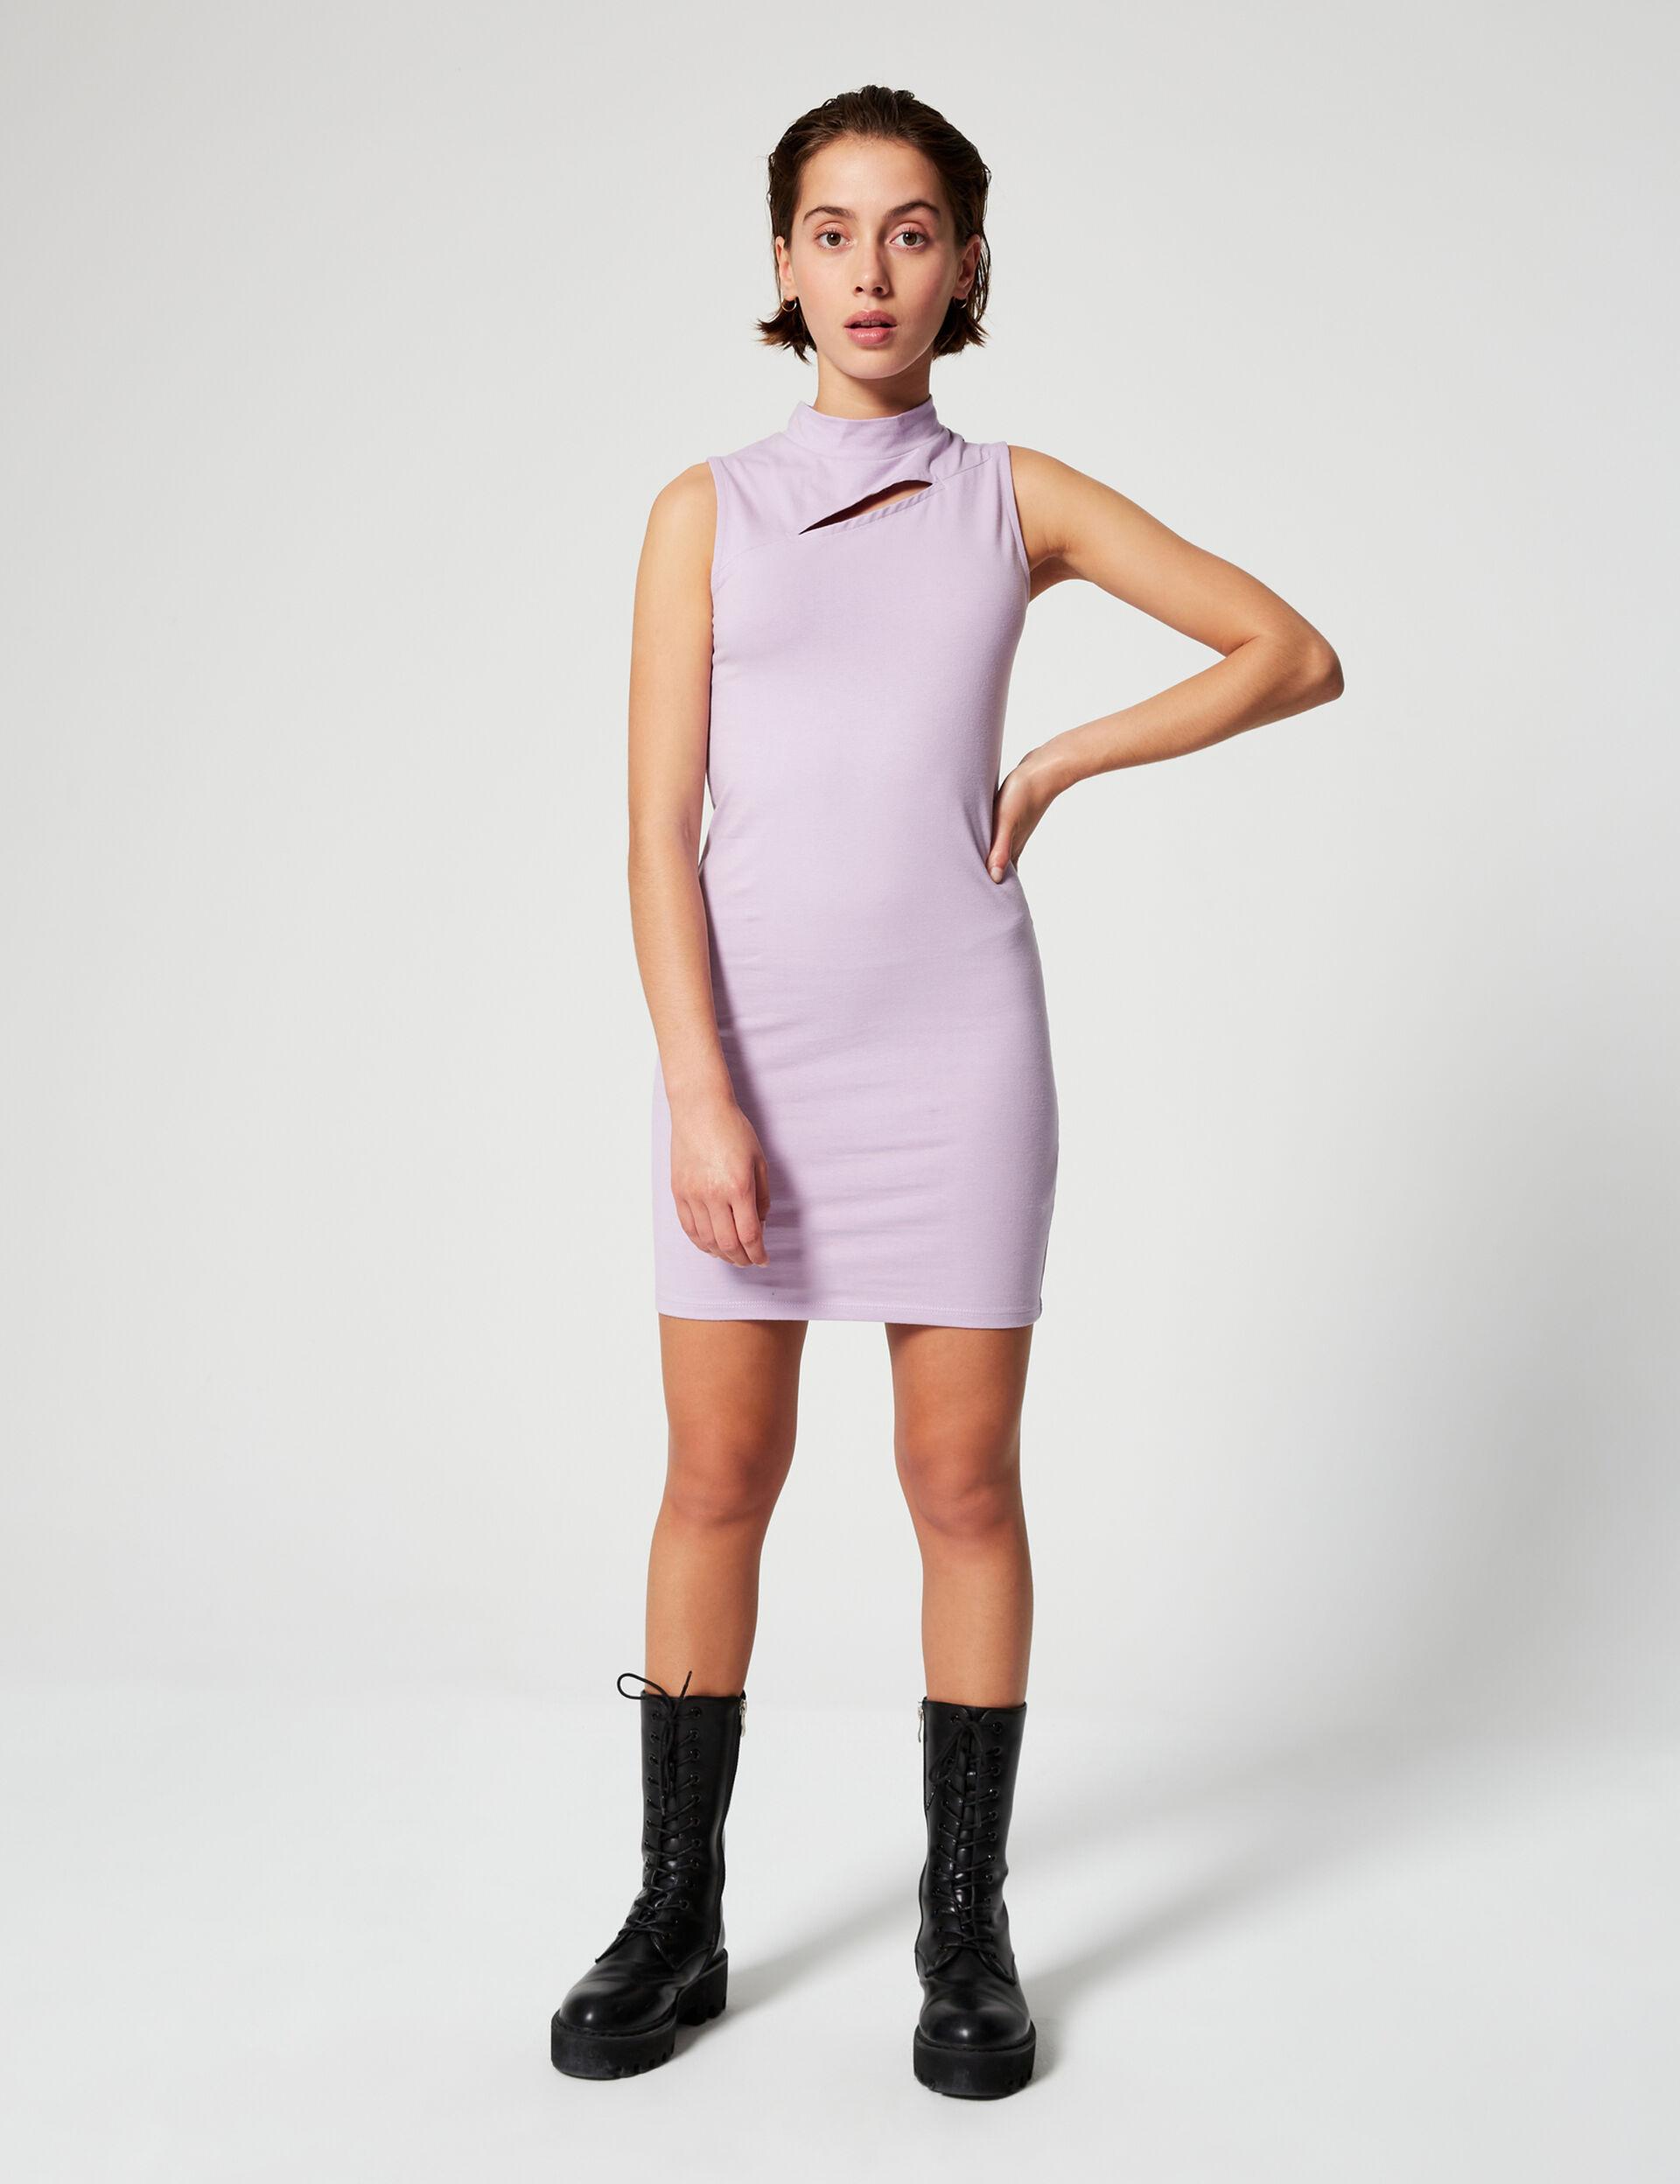 High-necked dress